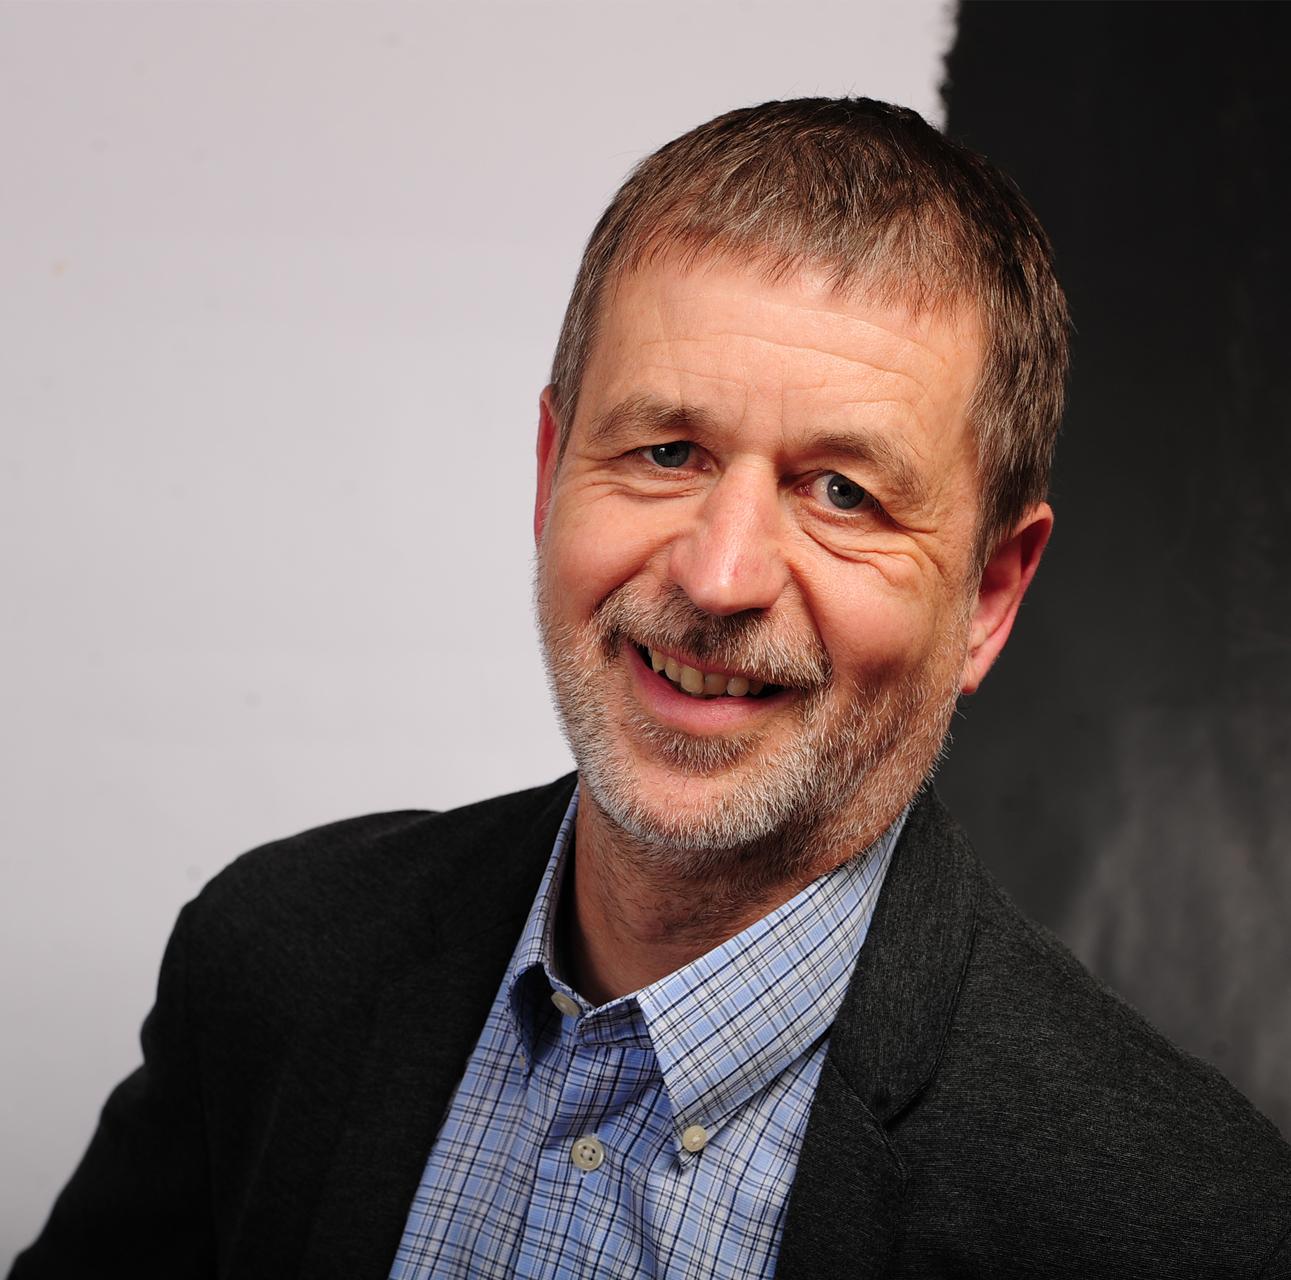 Bernd Baus